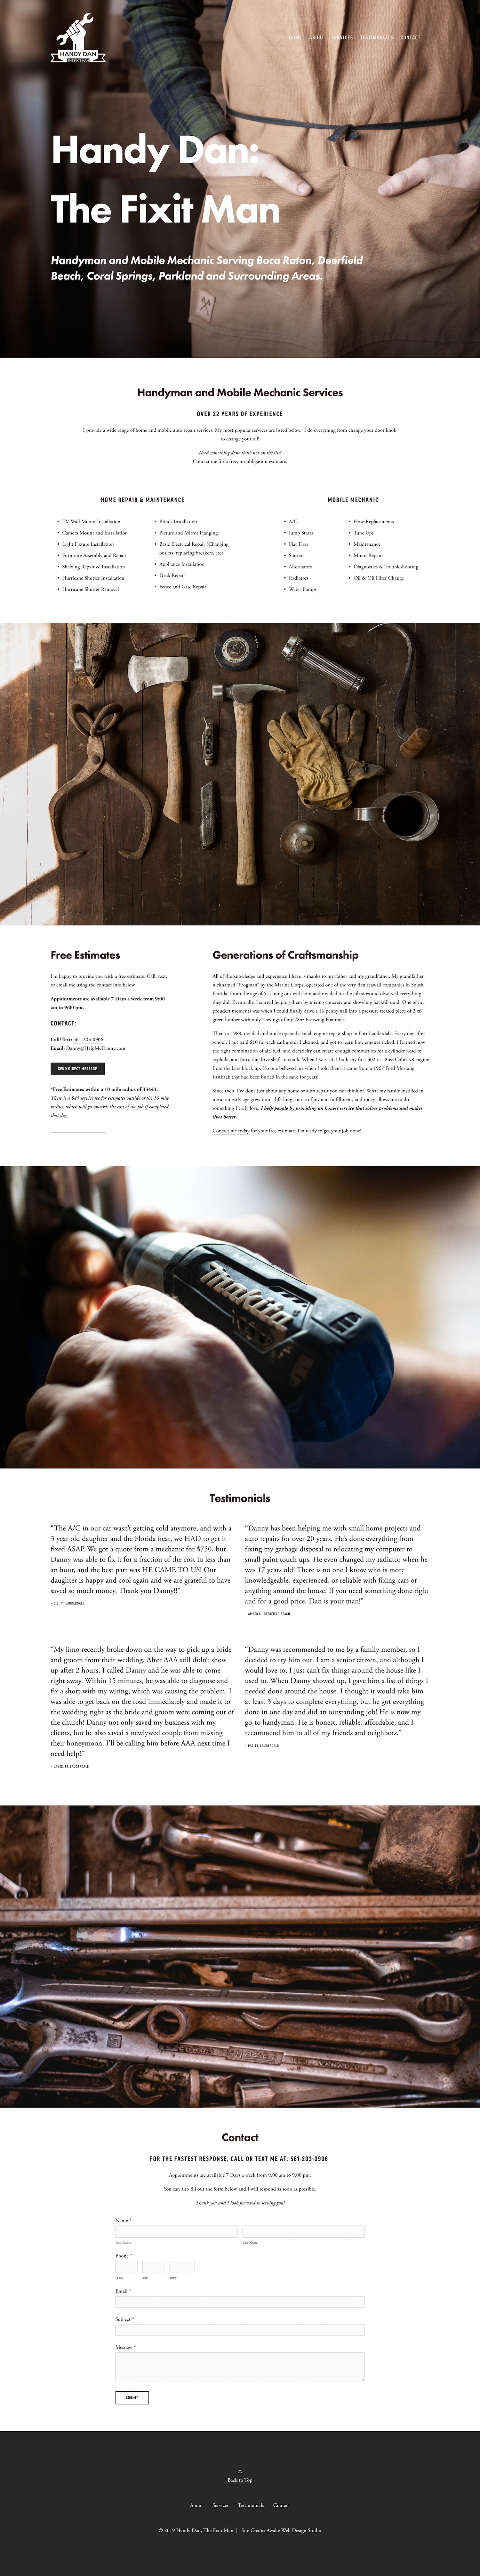 handyman-website-designer-awake-web-design.jpg